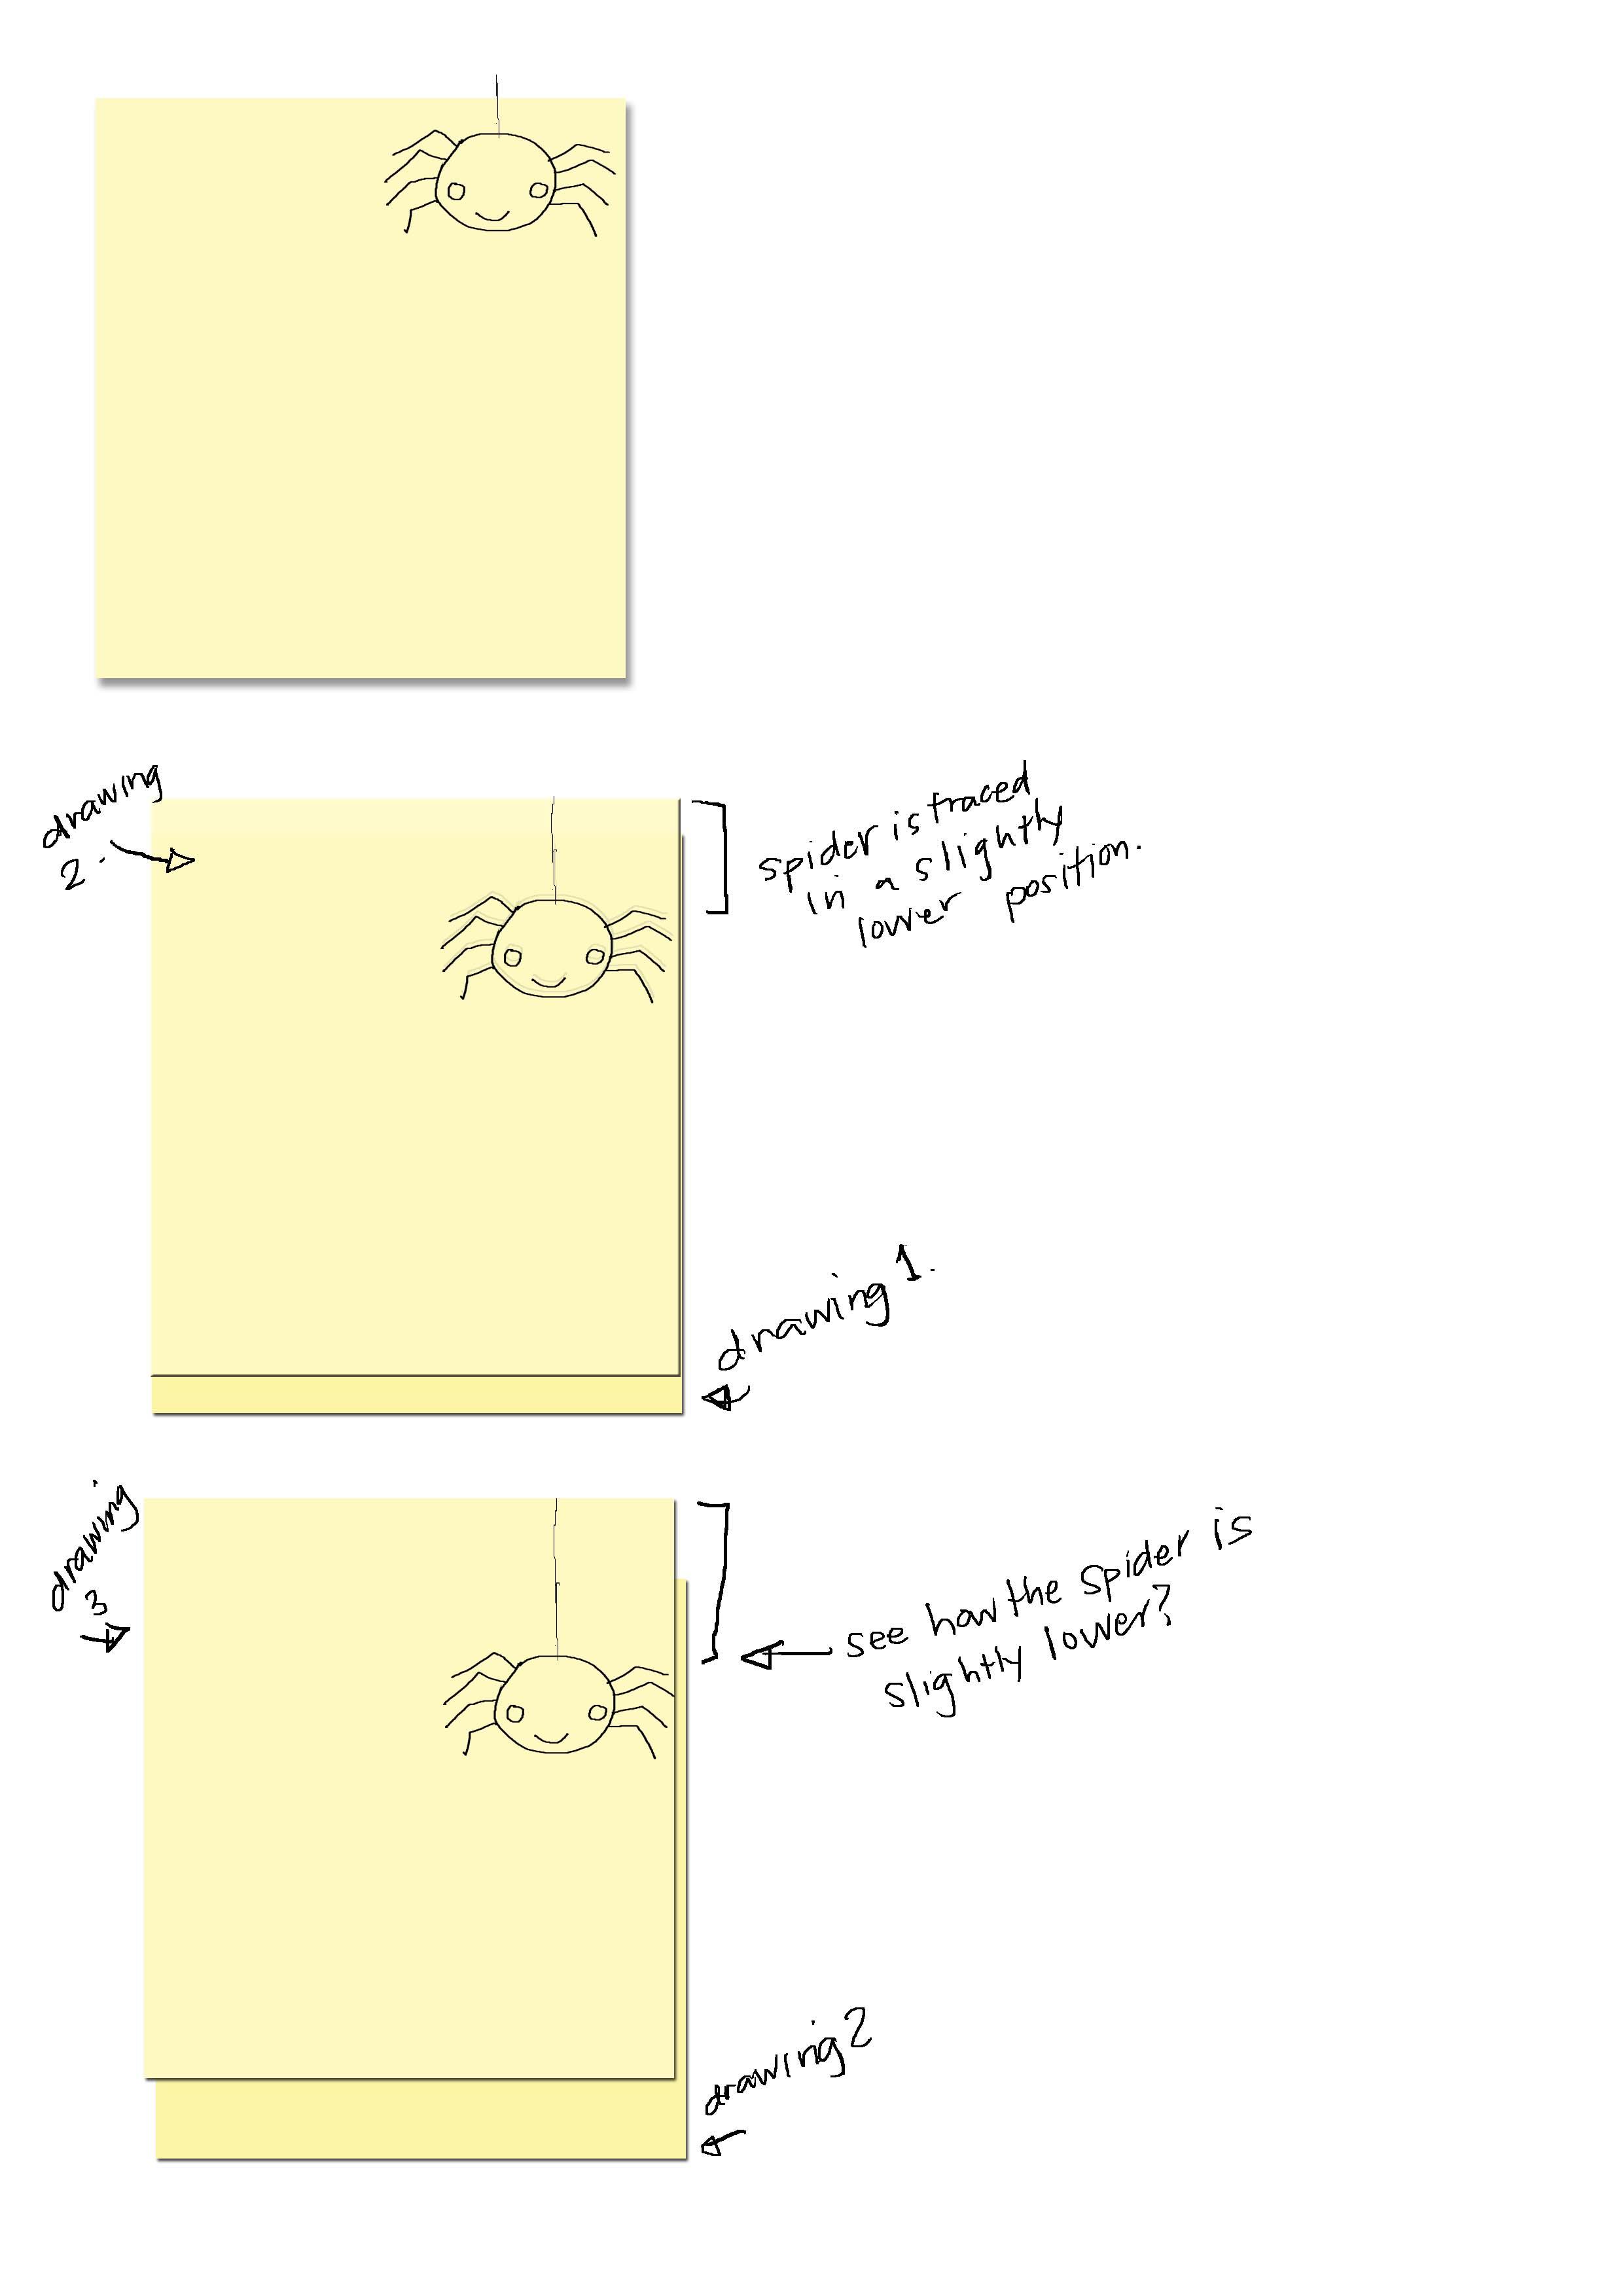 Animation (Flip Book) Workshop | ARTiculation360